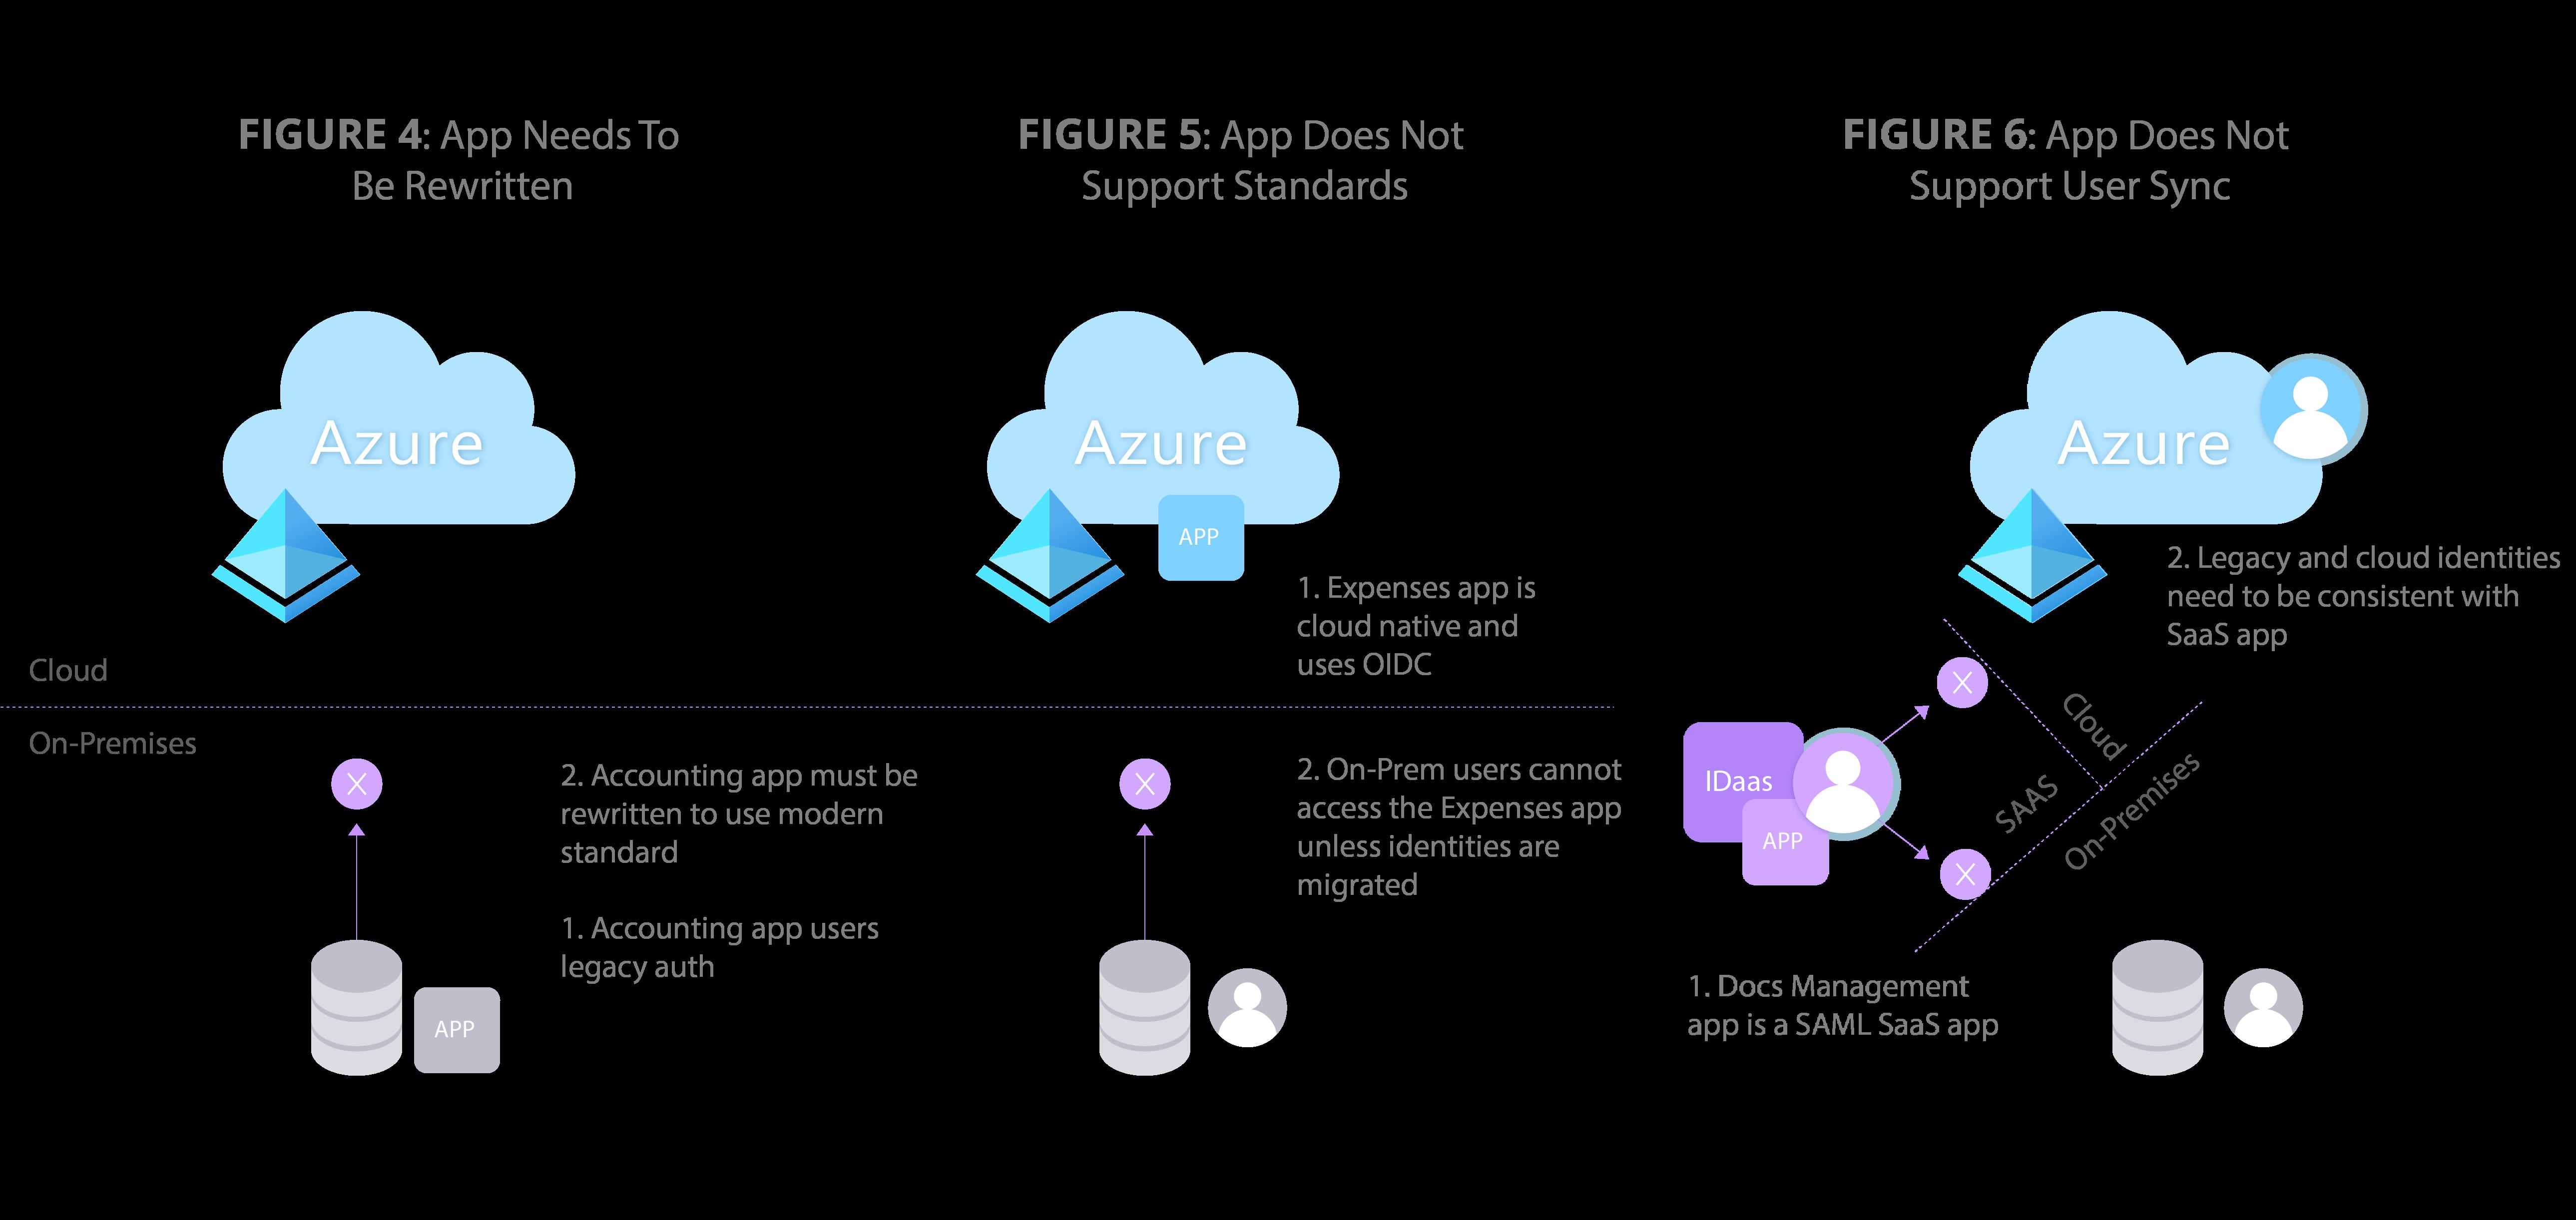 azure-identity-fragmentation-app-challenges